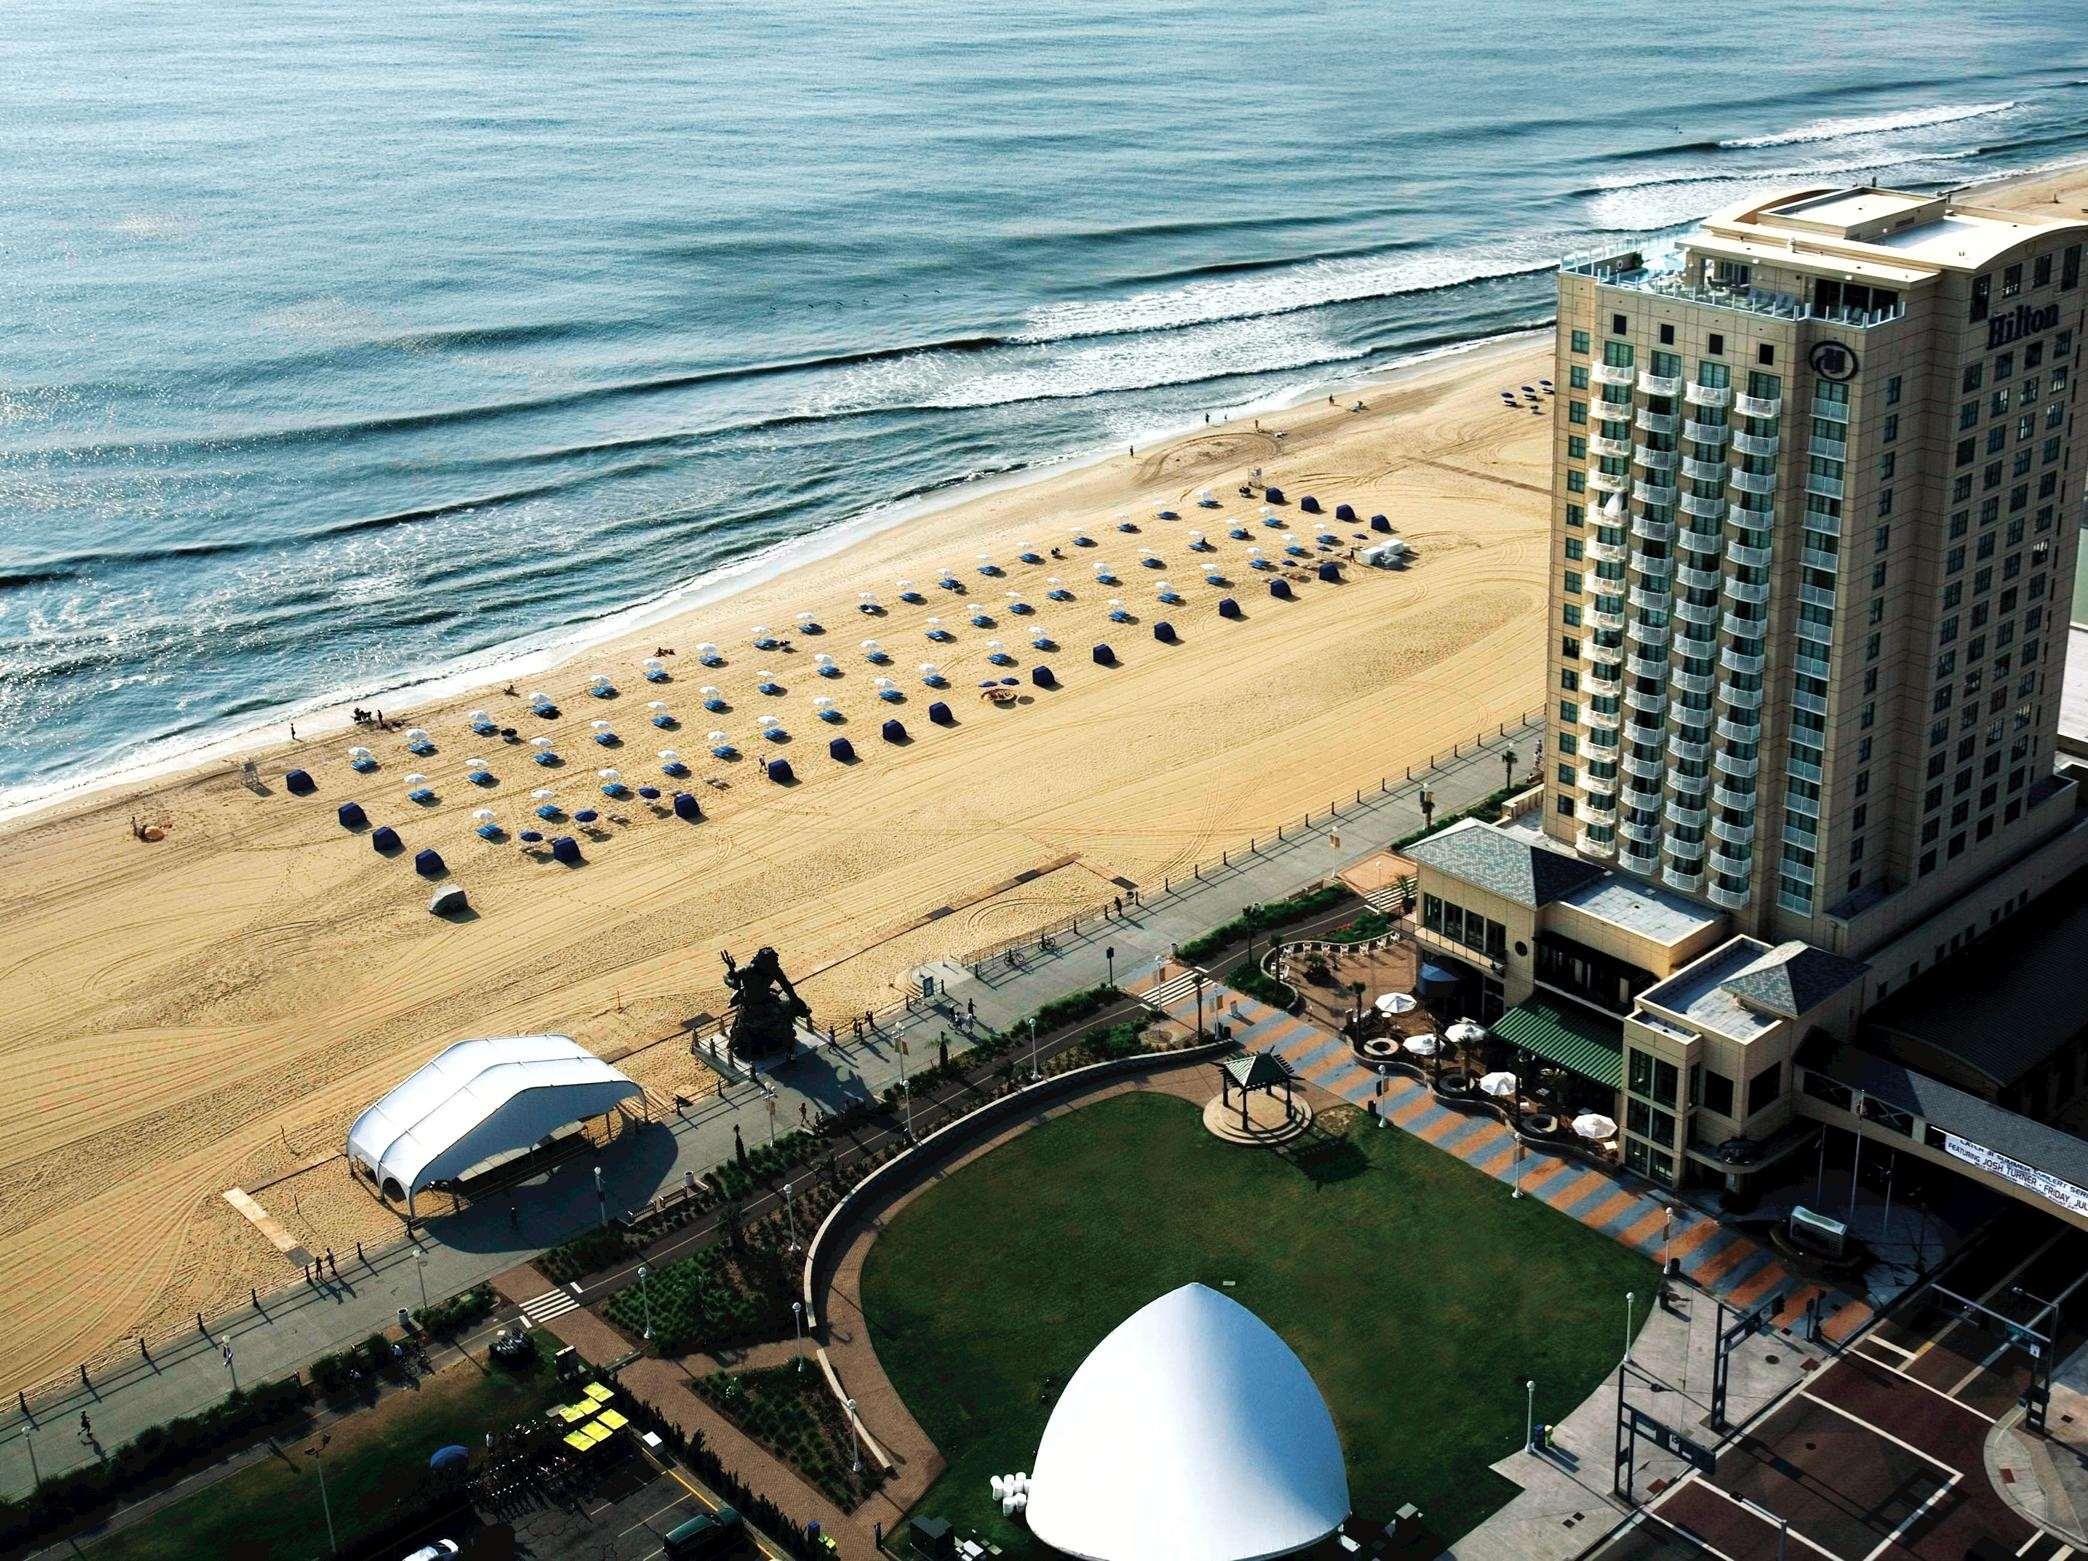 Hilton Virginia Beach Oceanfront View